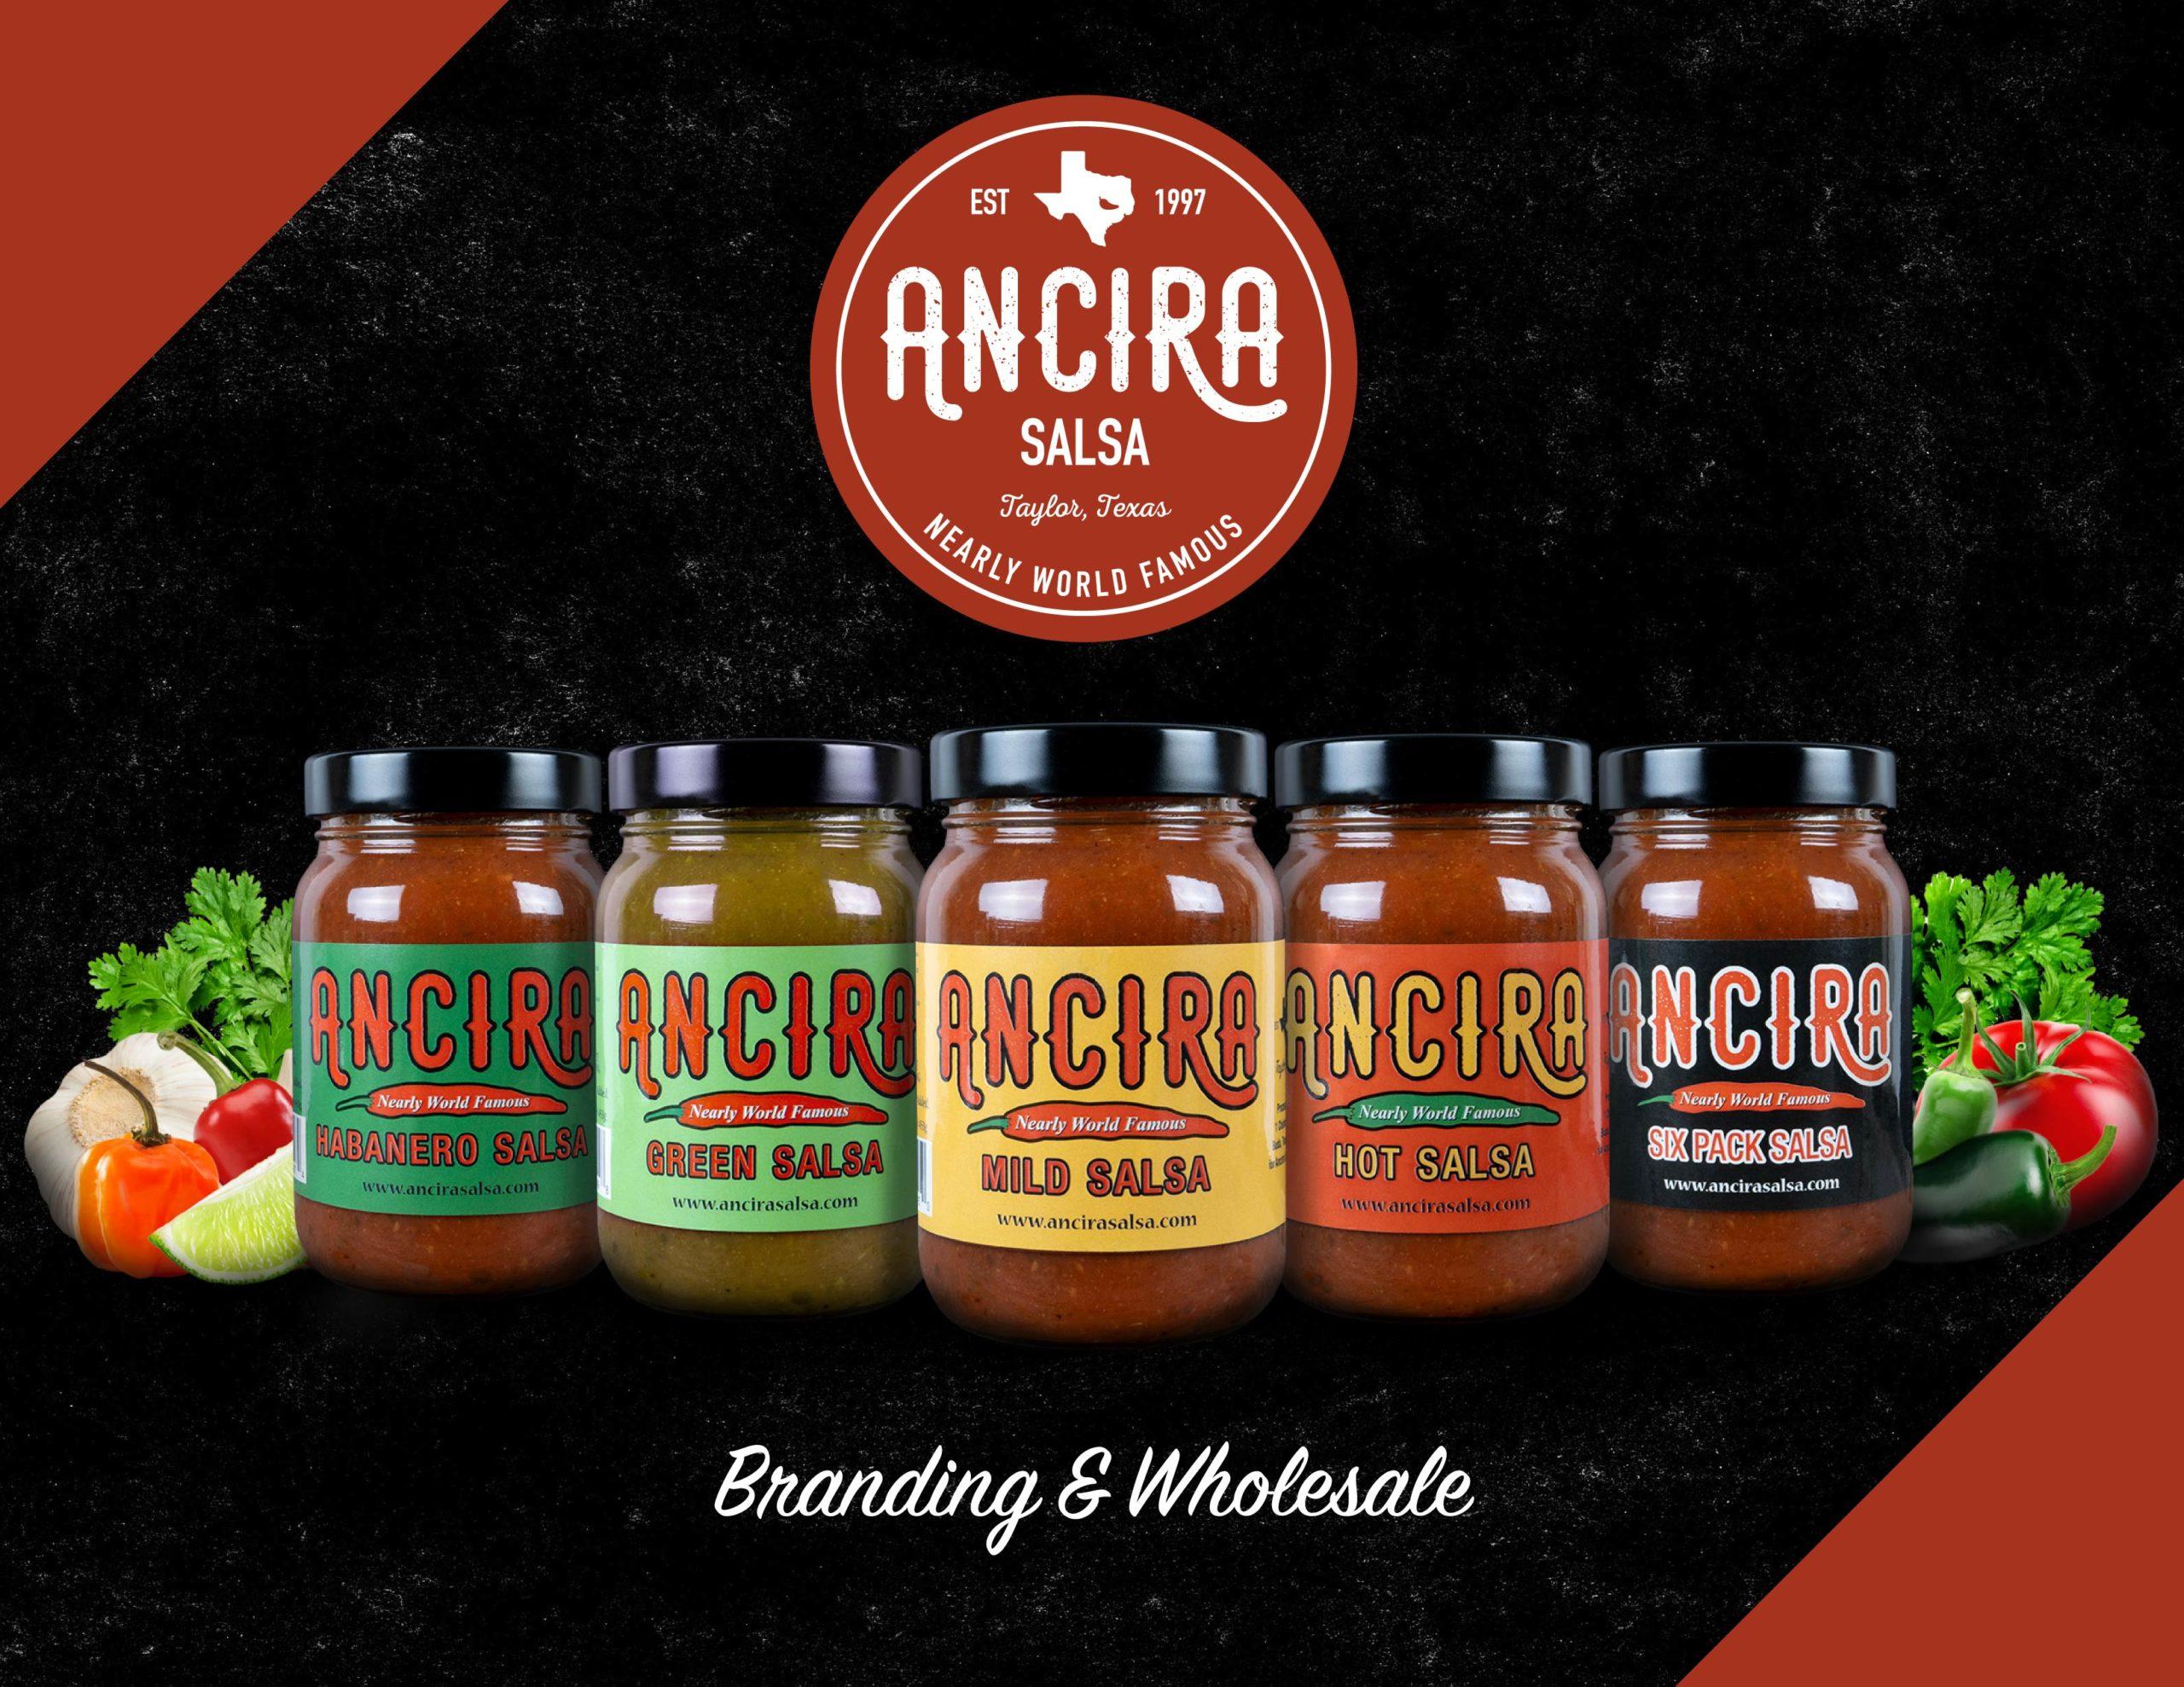 Ancira_Salsa_Branding _and_Wholesale_Sheet-Editable-01